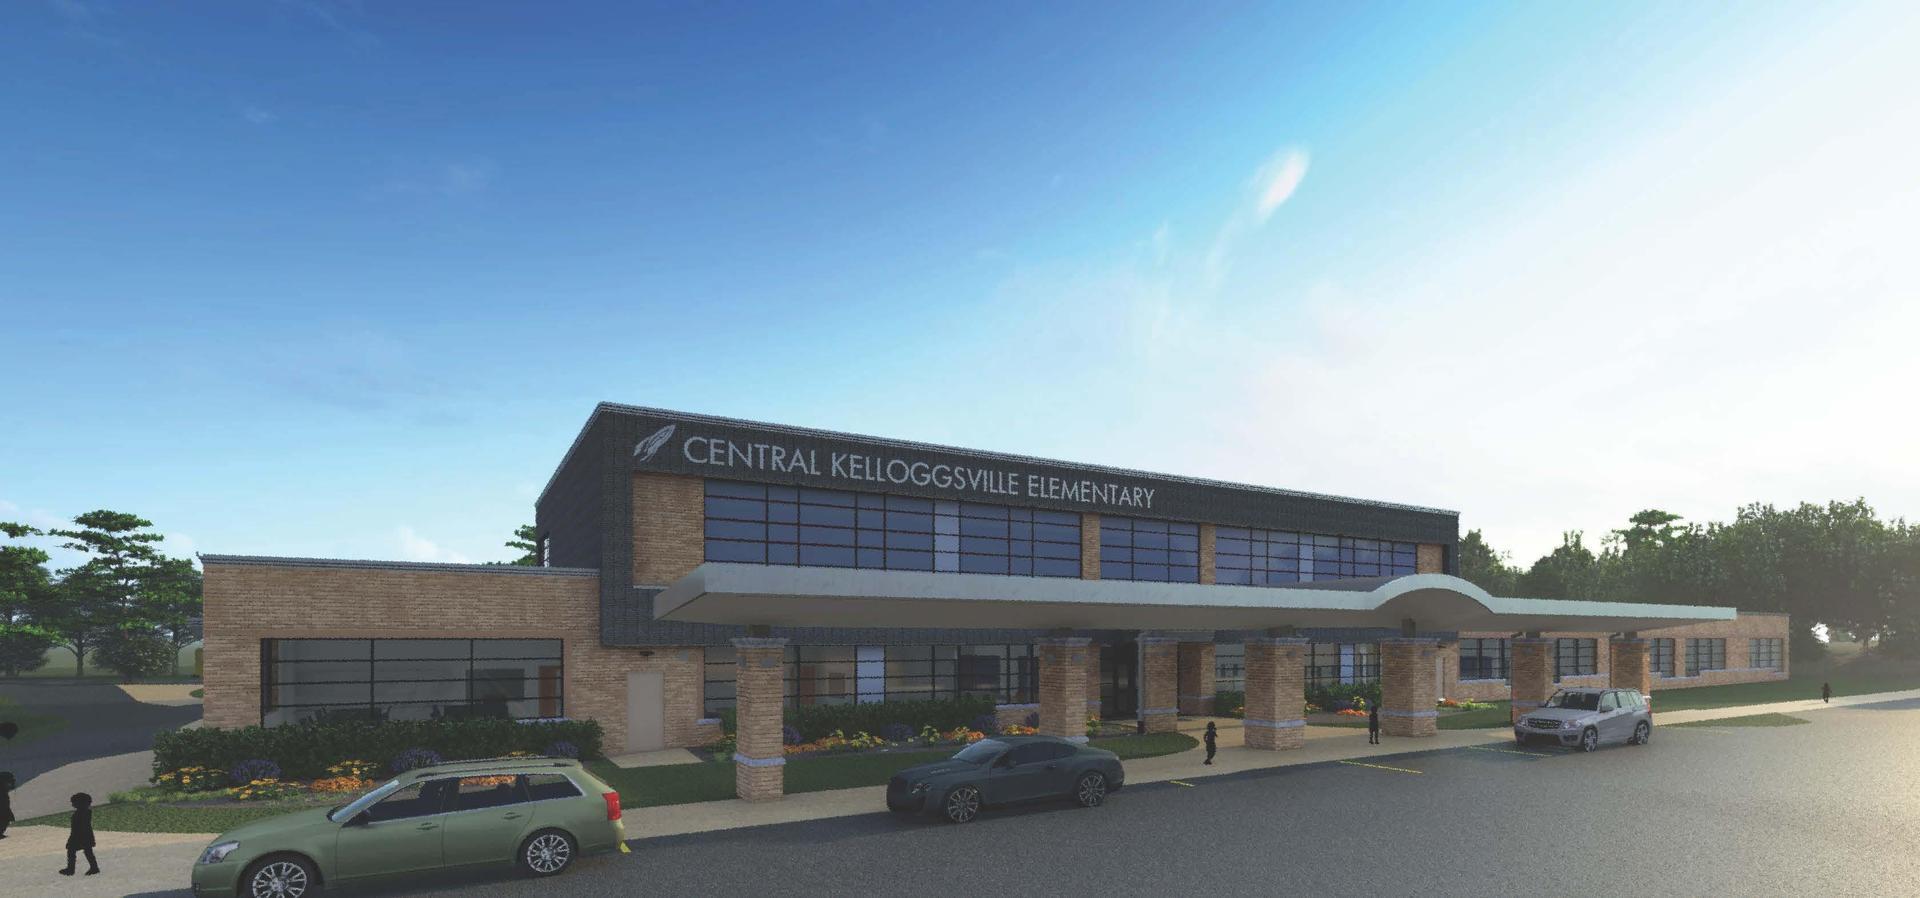 Central Kelloggsville Elementary